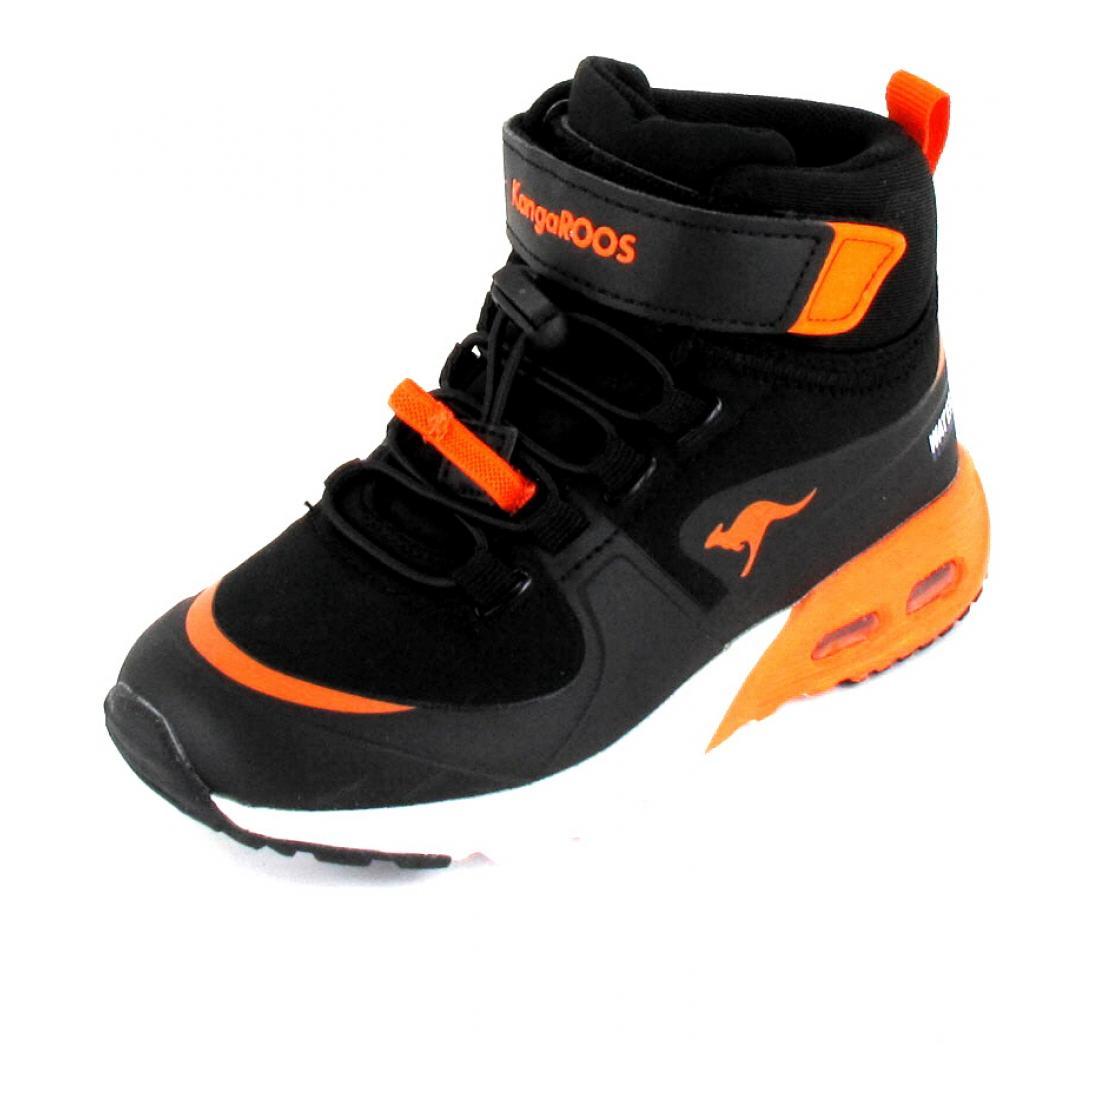 KangaRoos Sneaker high KX-Hydro